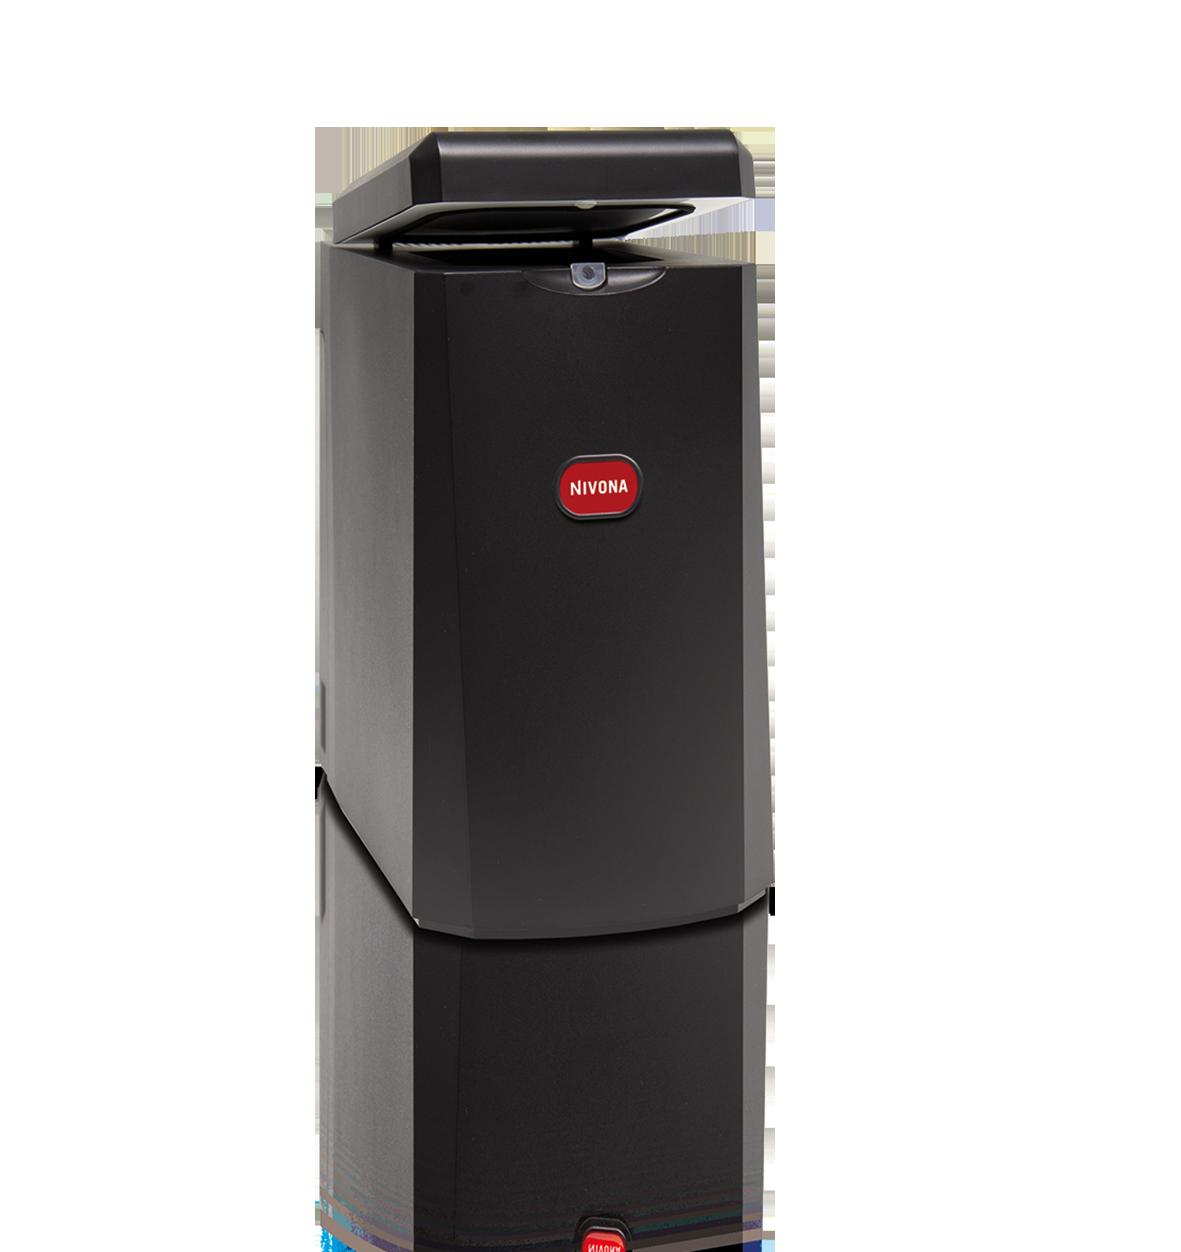 NIVONA NICO100 Cooler